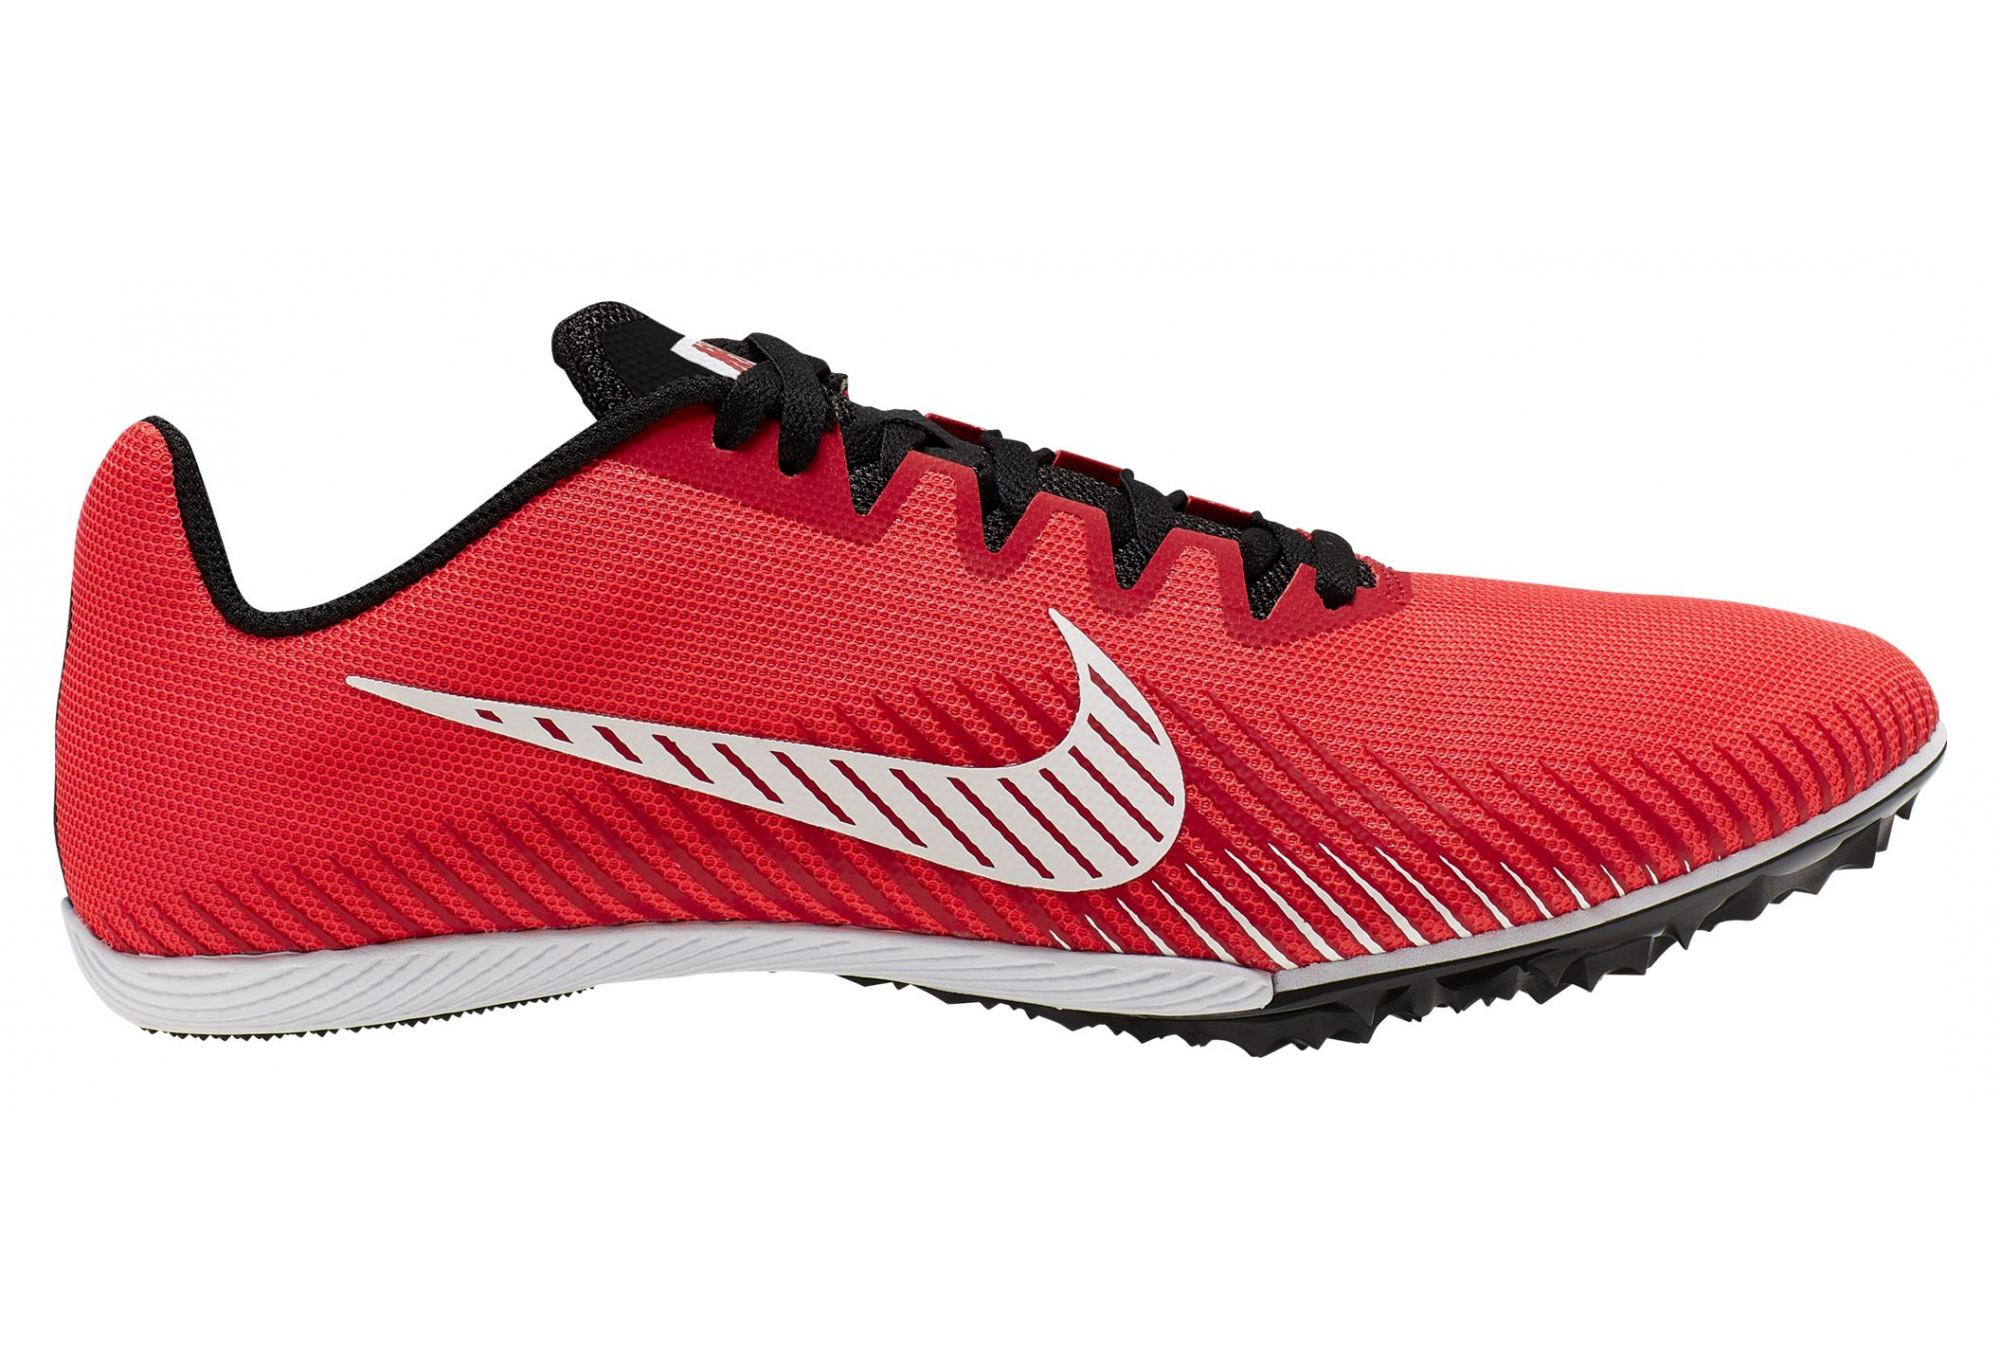 Escepticismo borde Atajos  Nike Zoom Rival M9 Red Unisex | Alltricks.com